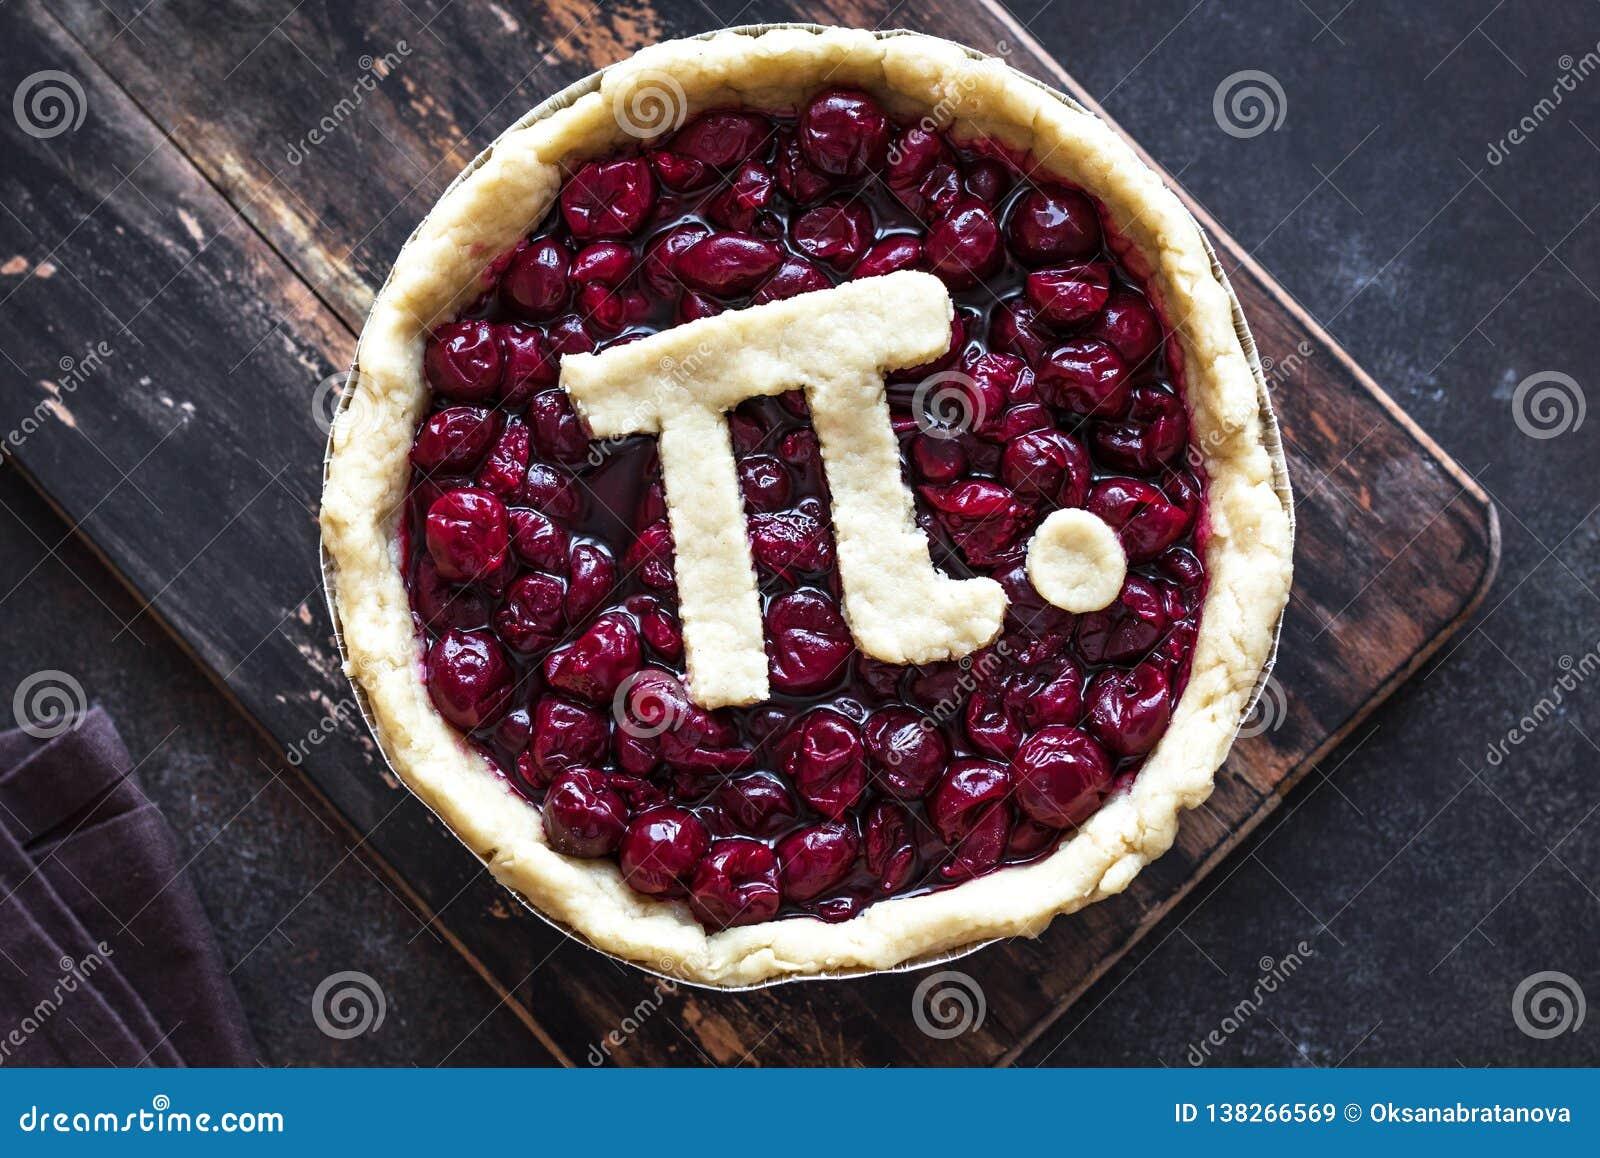 Pidag Cherry Pie